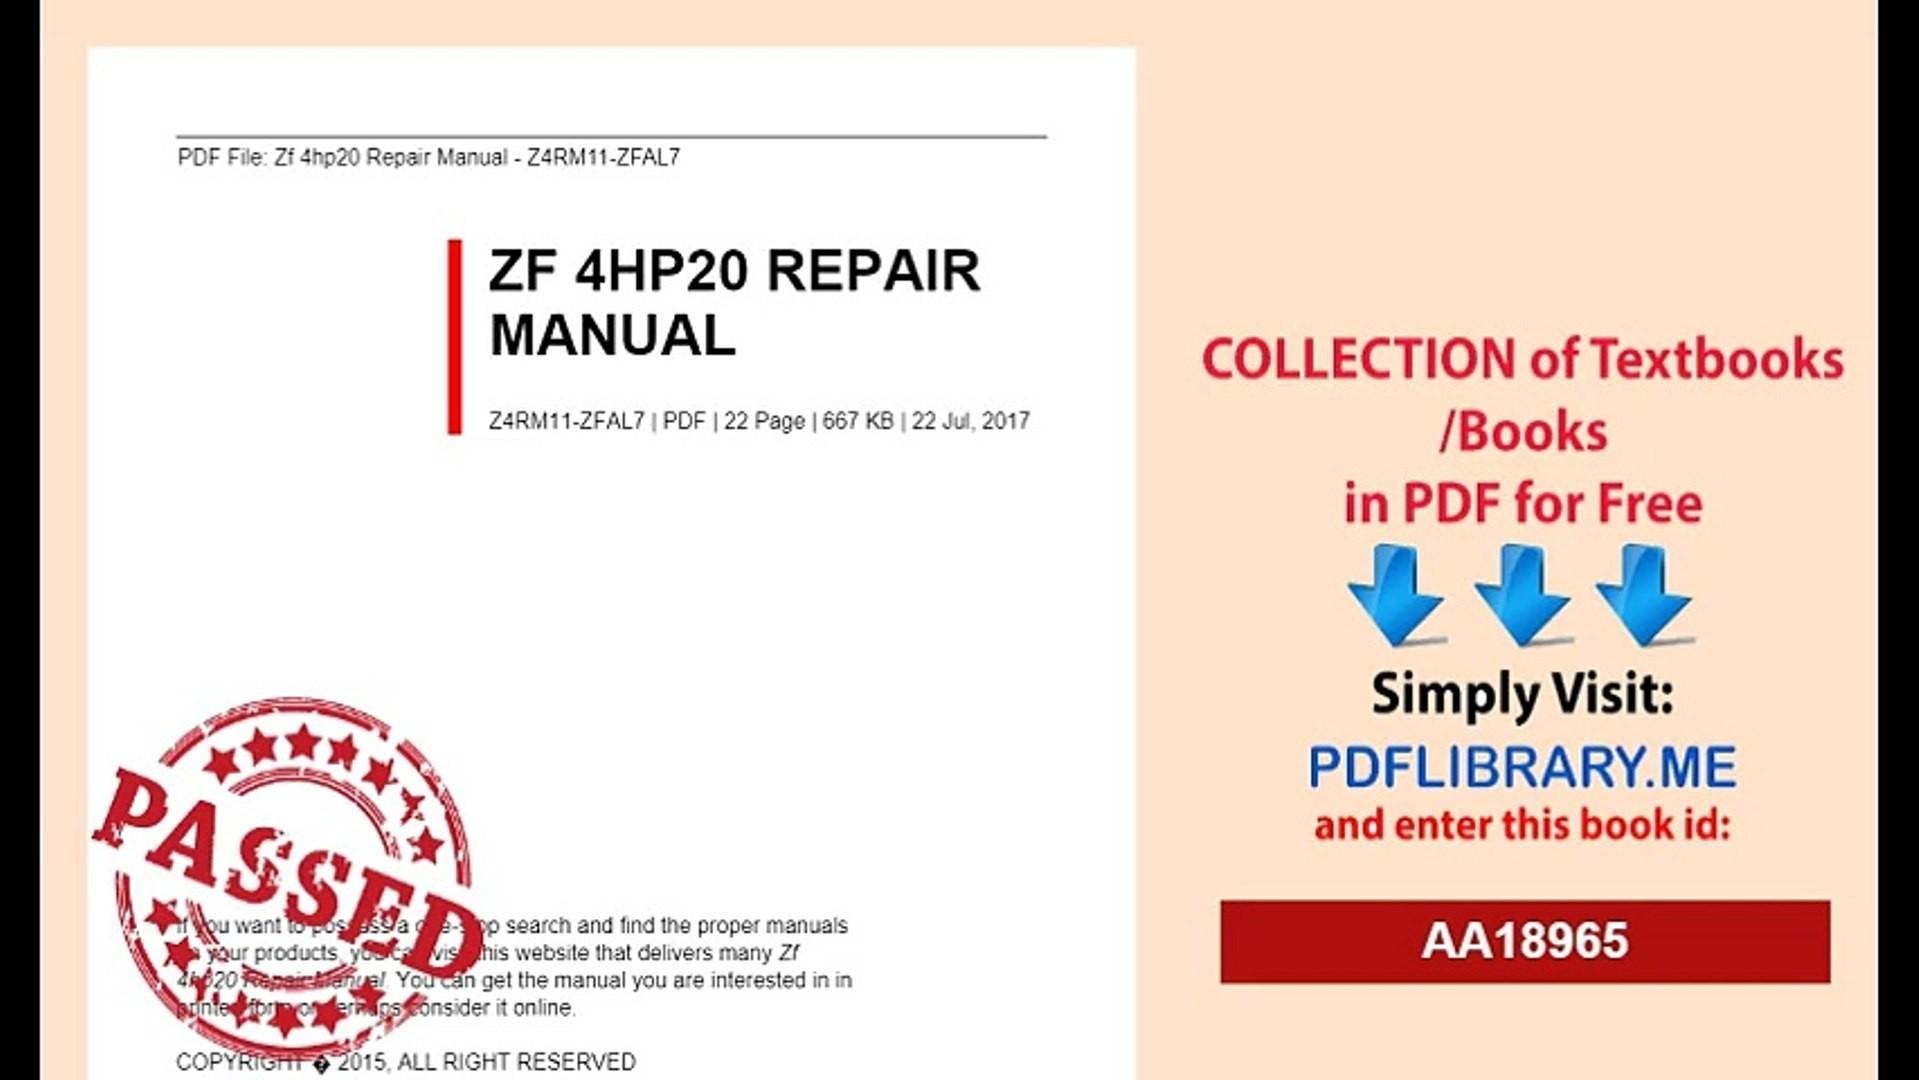 Array zf 4hp20 repair manual ebook rh zf 4hp20 repair manual ebook bitlab solutions